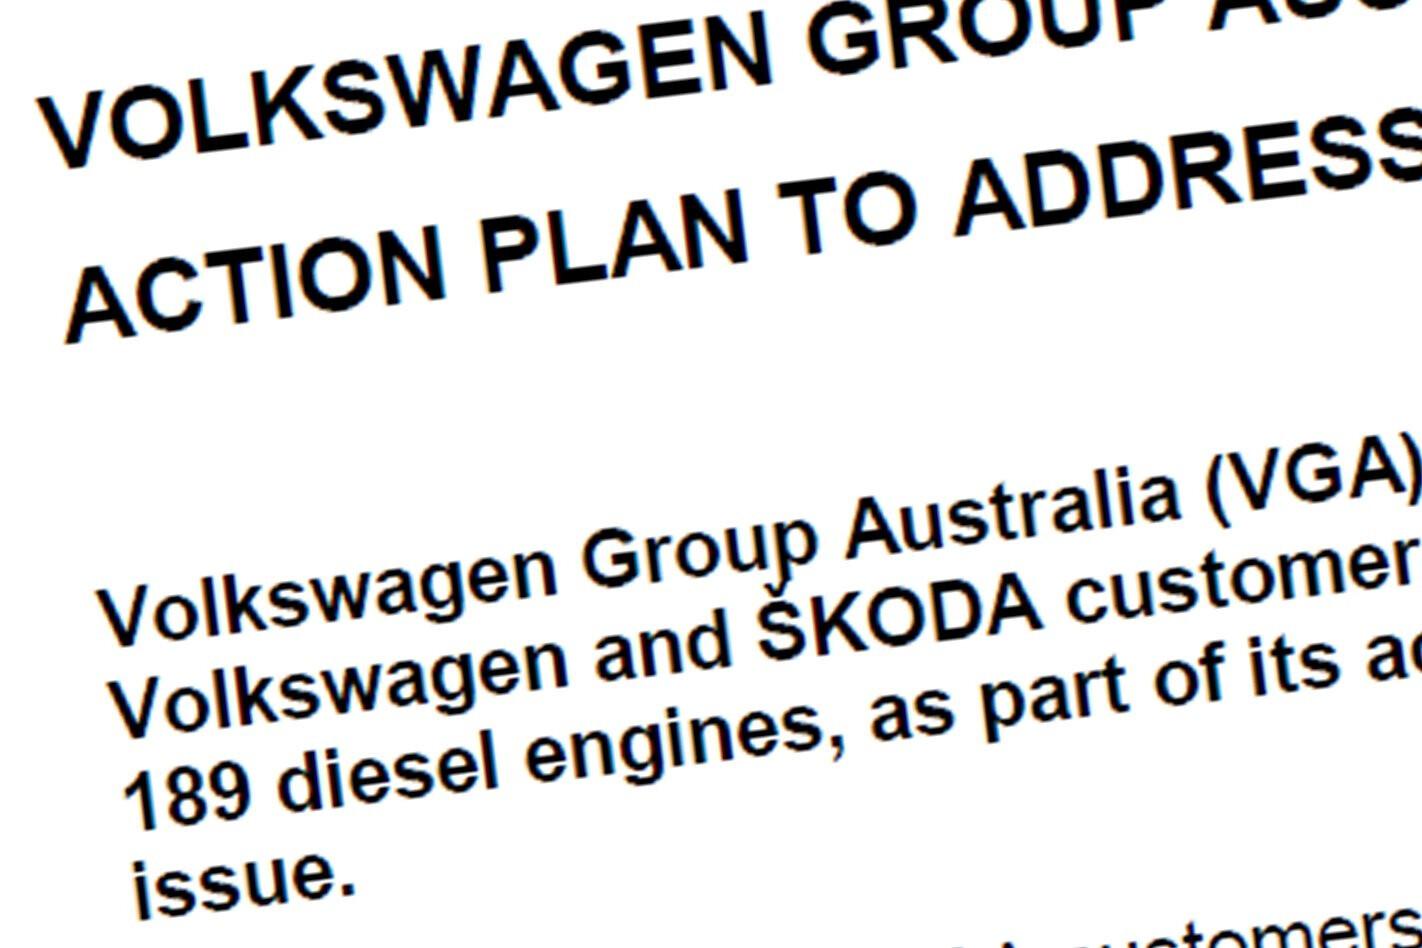 Volkswagen Australia's statement in full